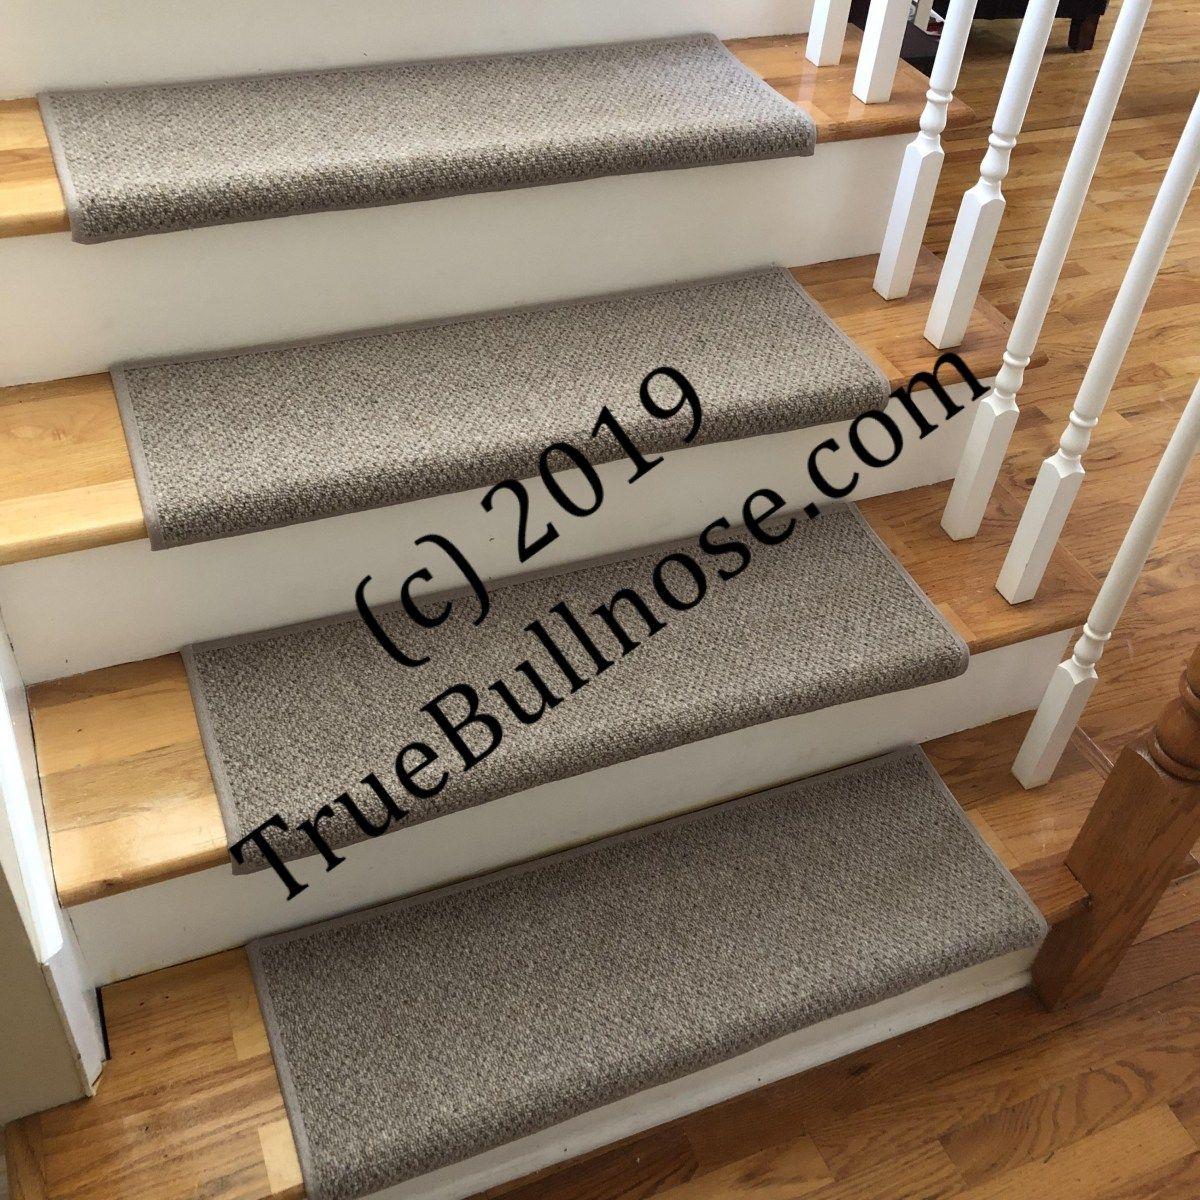 Best Windsor Driftwood 100 Wool True Bullnose™ Carpet Stair Tread Jmish Dog Cat Pet Safety Runner 400 x 300